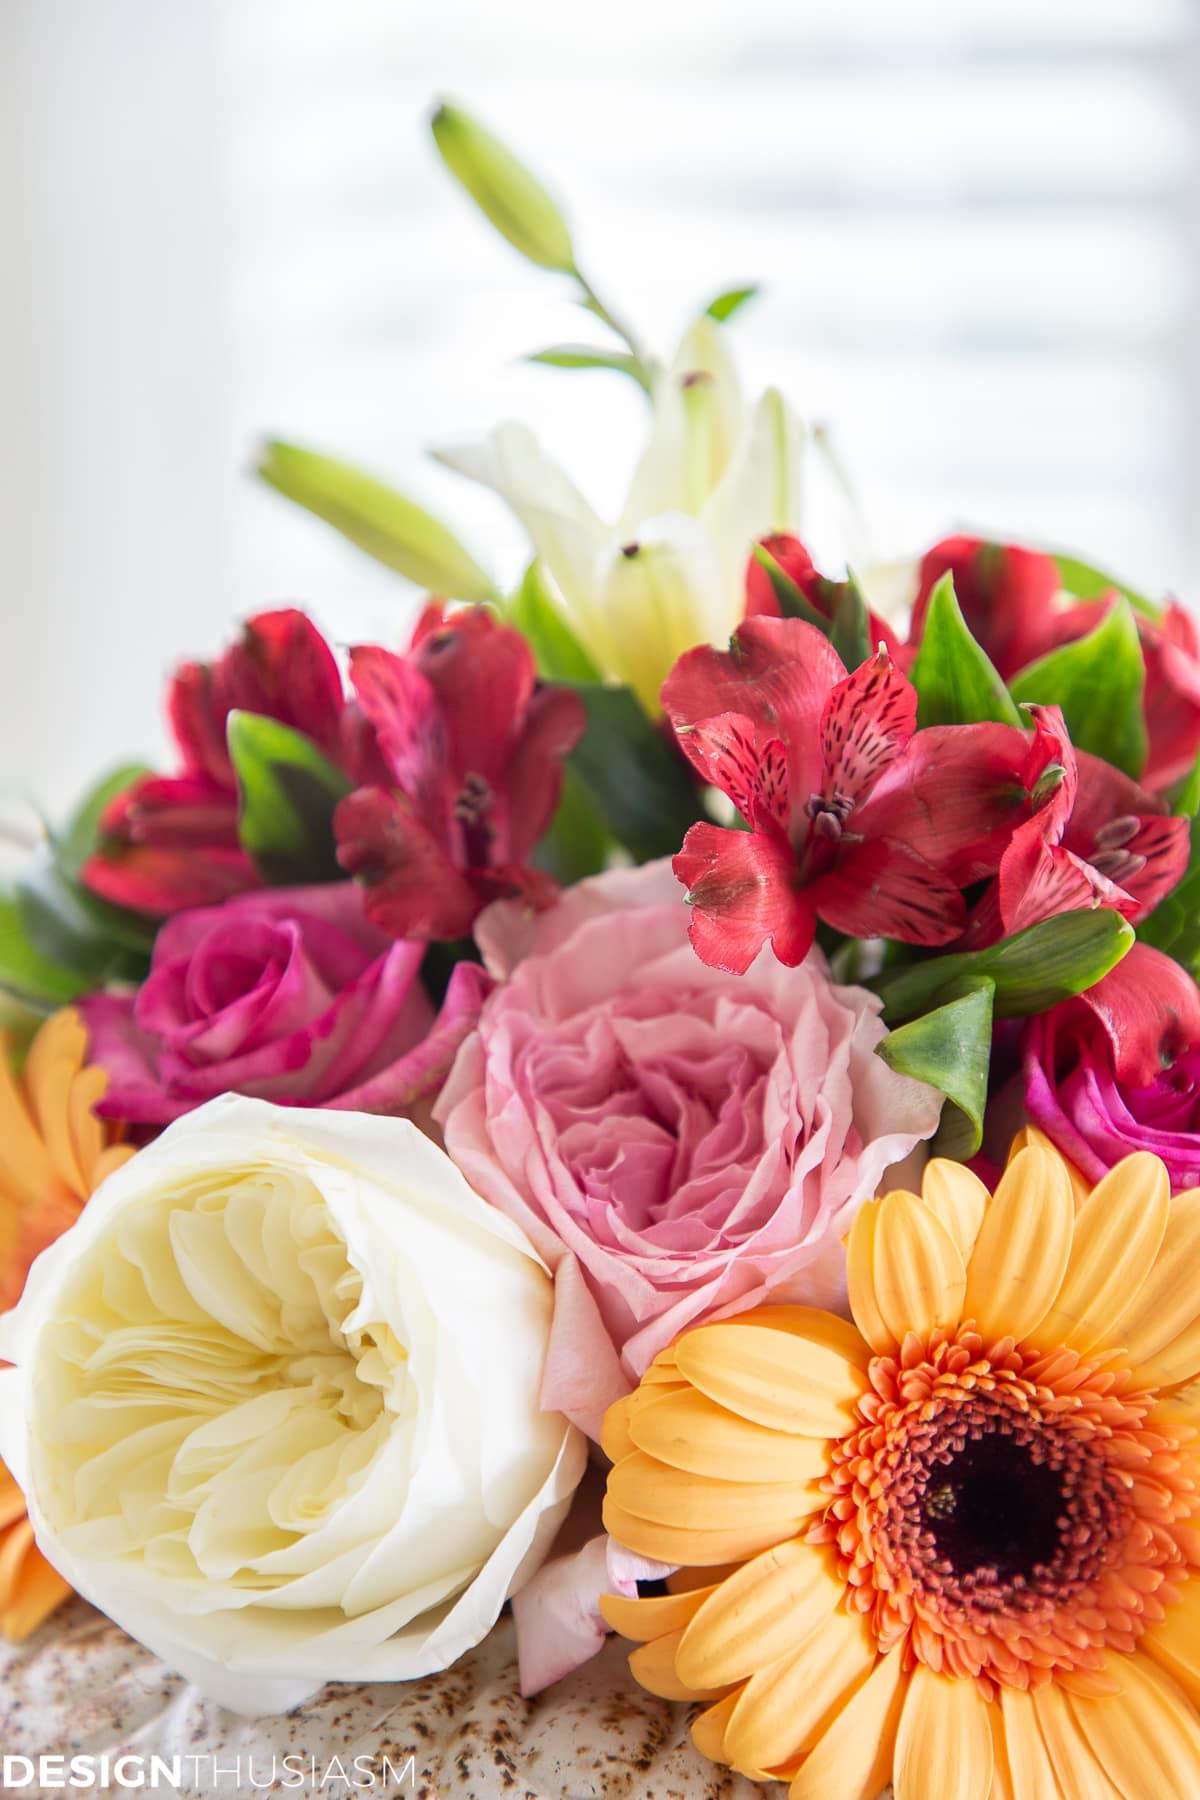 floral arrangement for an informal table setting